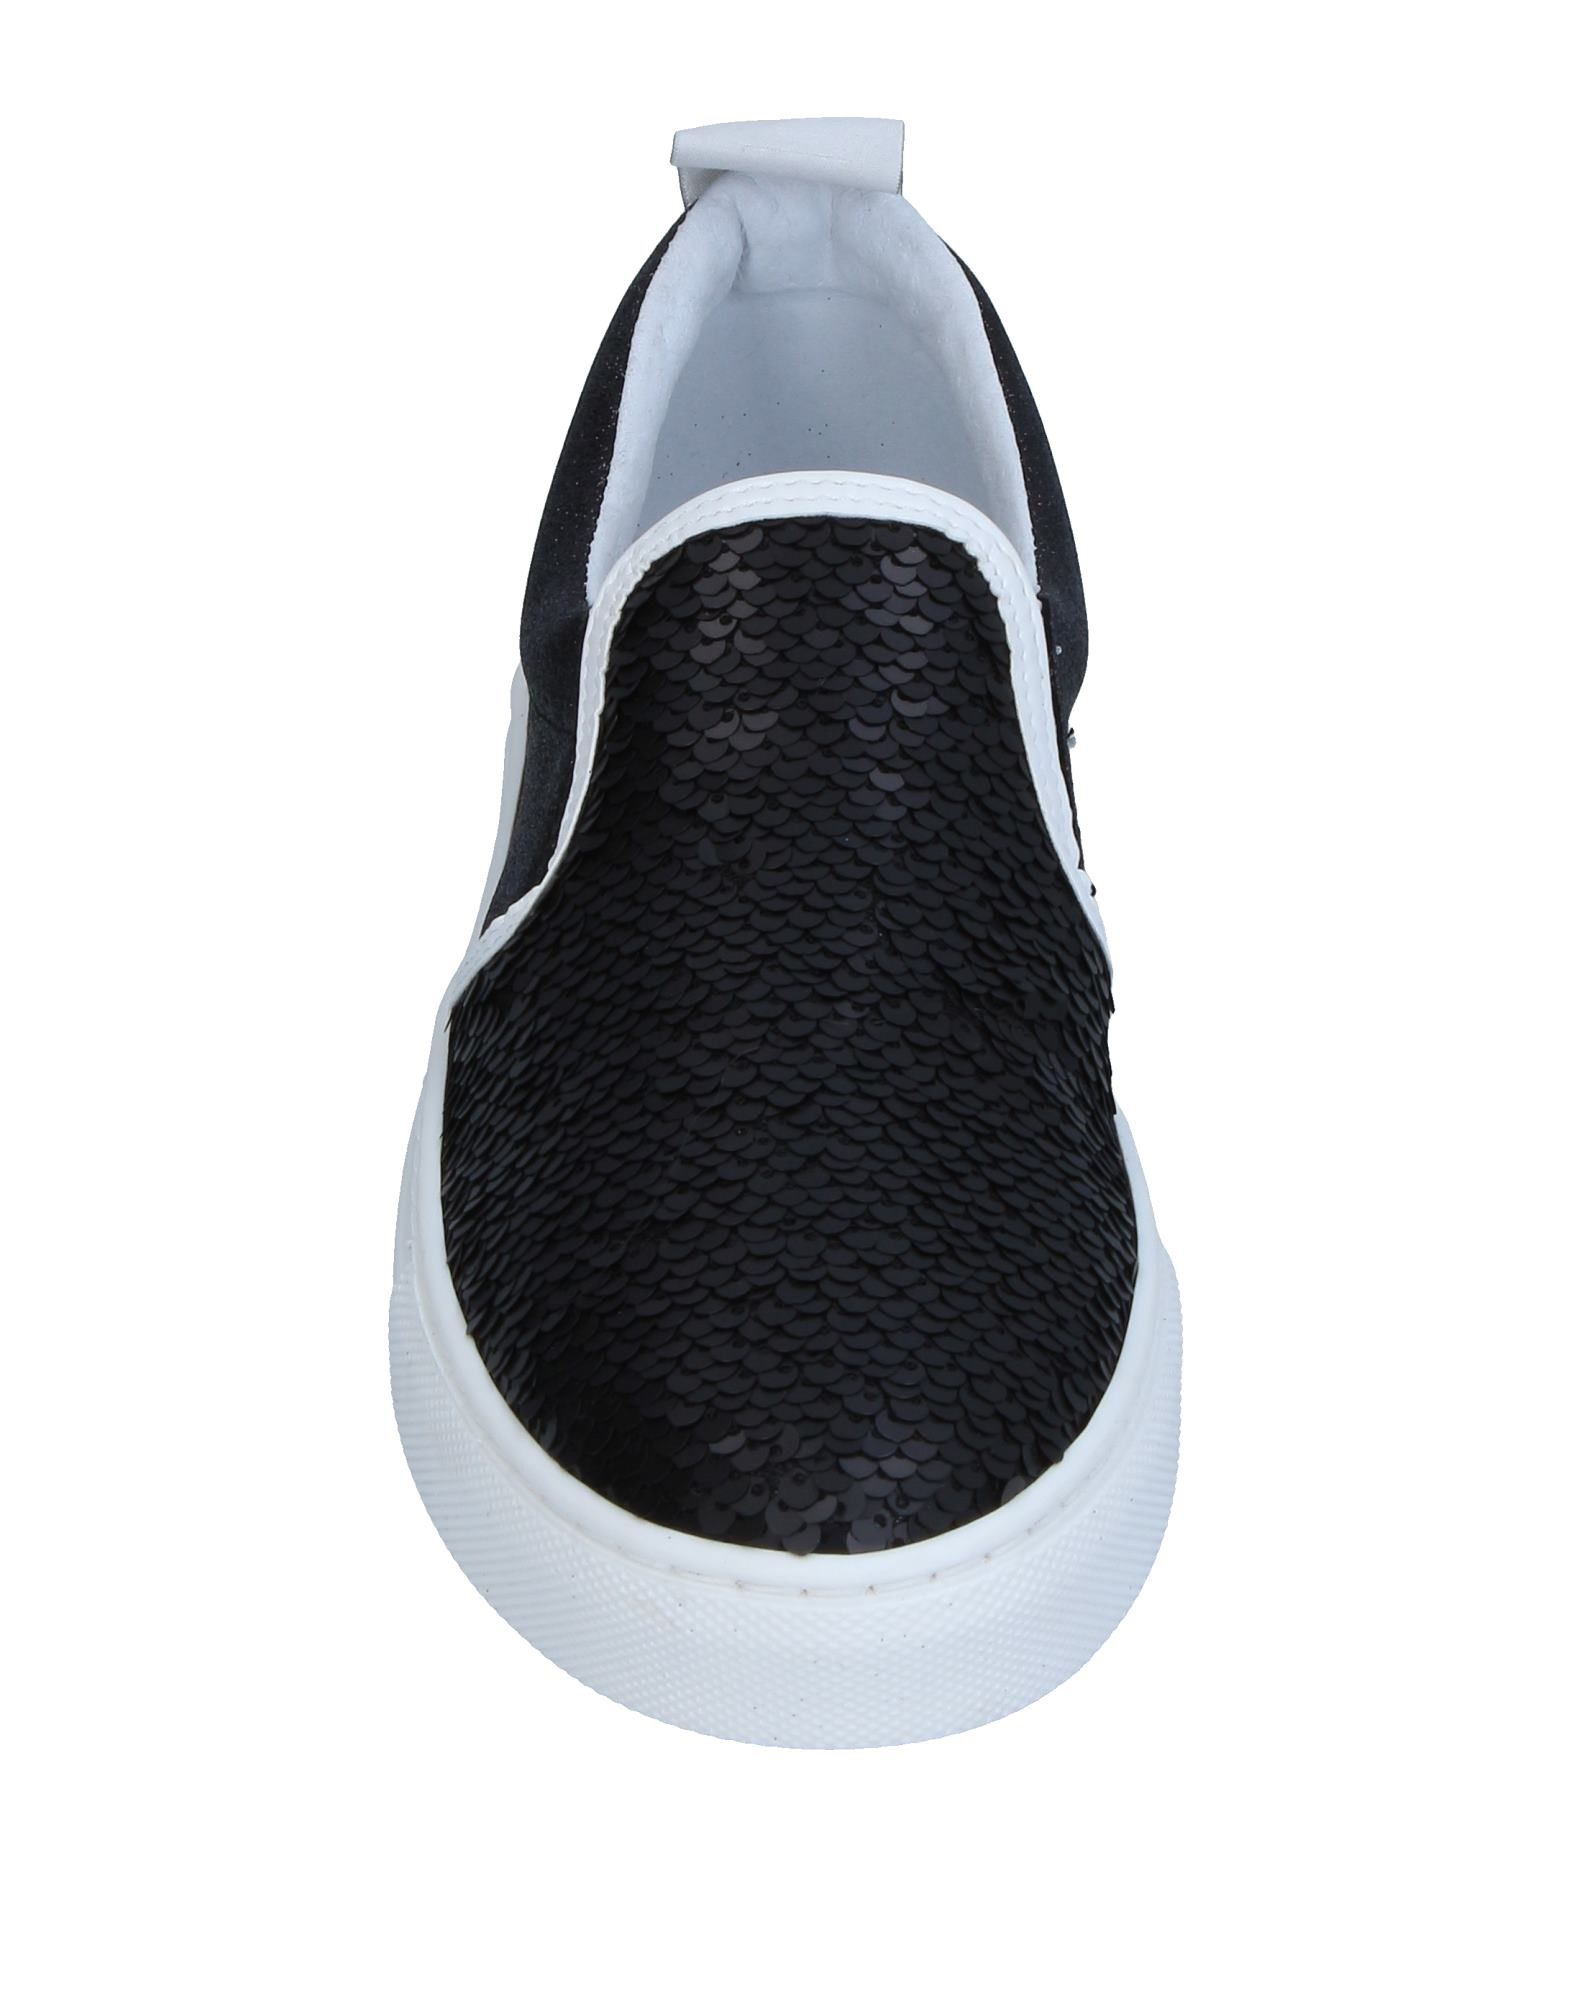 Sneakers Shop ★ Art Femme - Sneakers Shop ★ Art sur